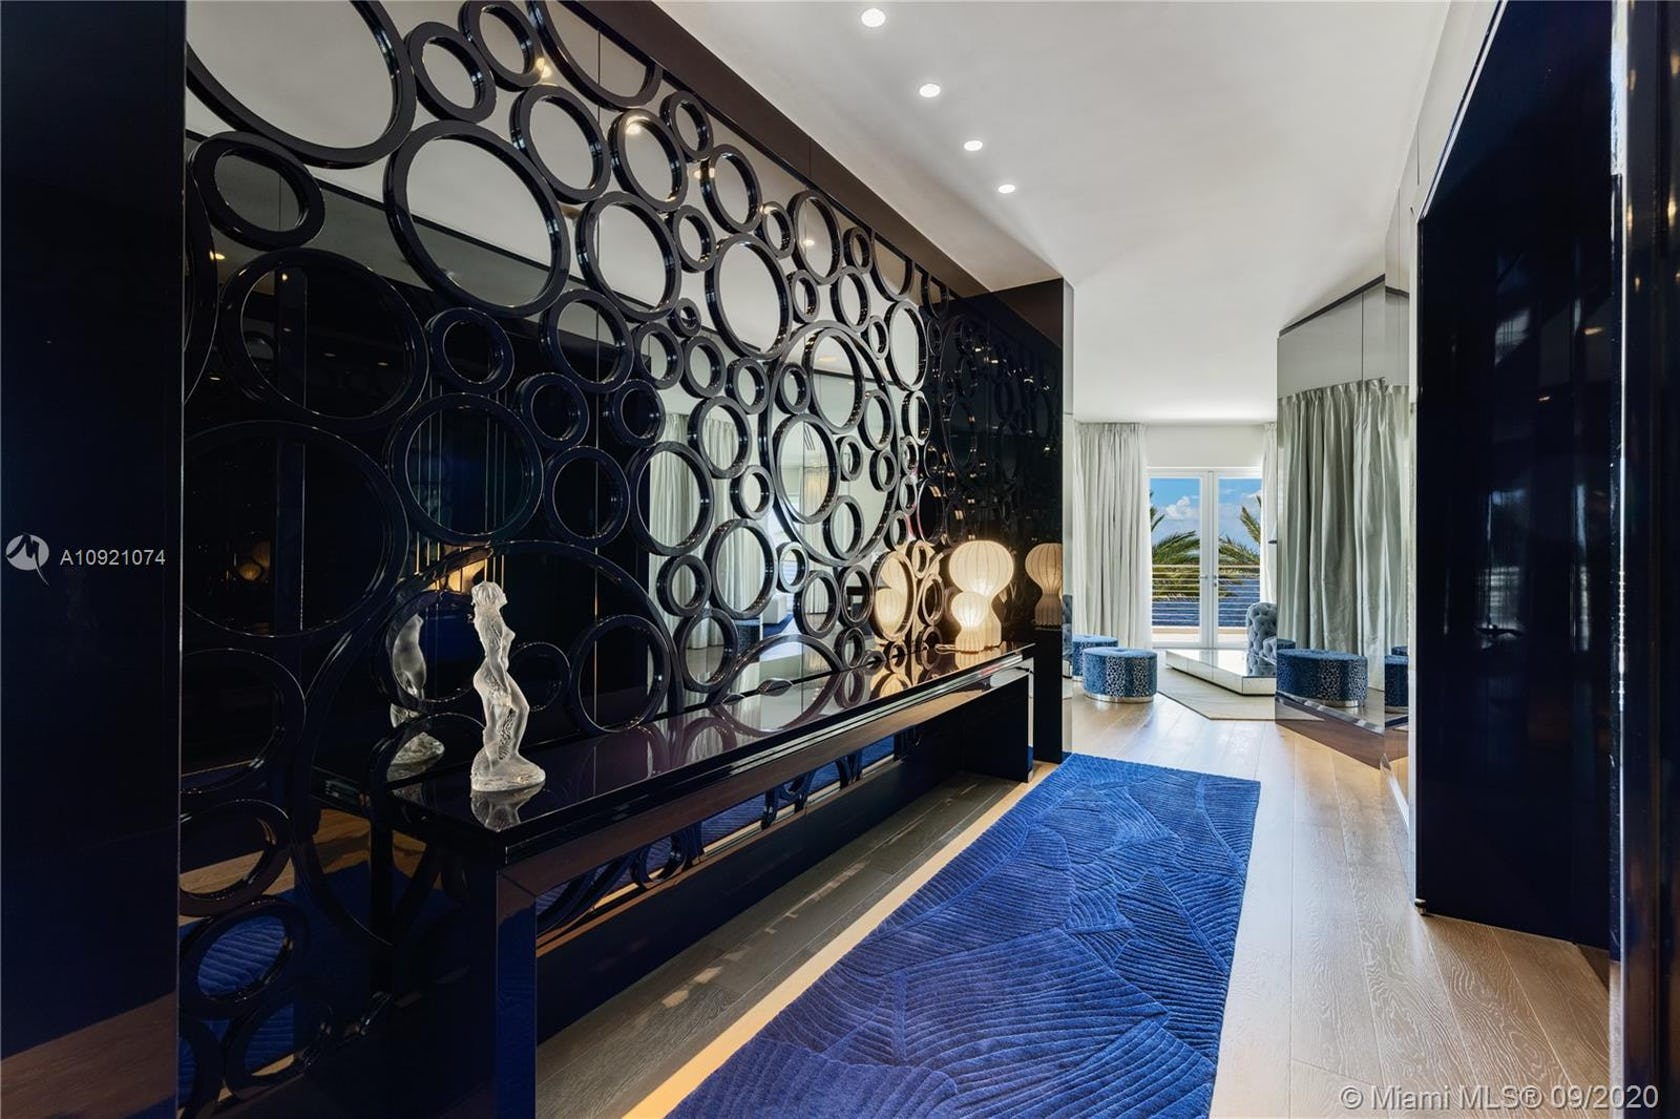 flooring floor interior design indoors lobby room living room